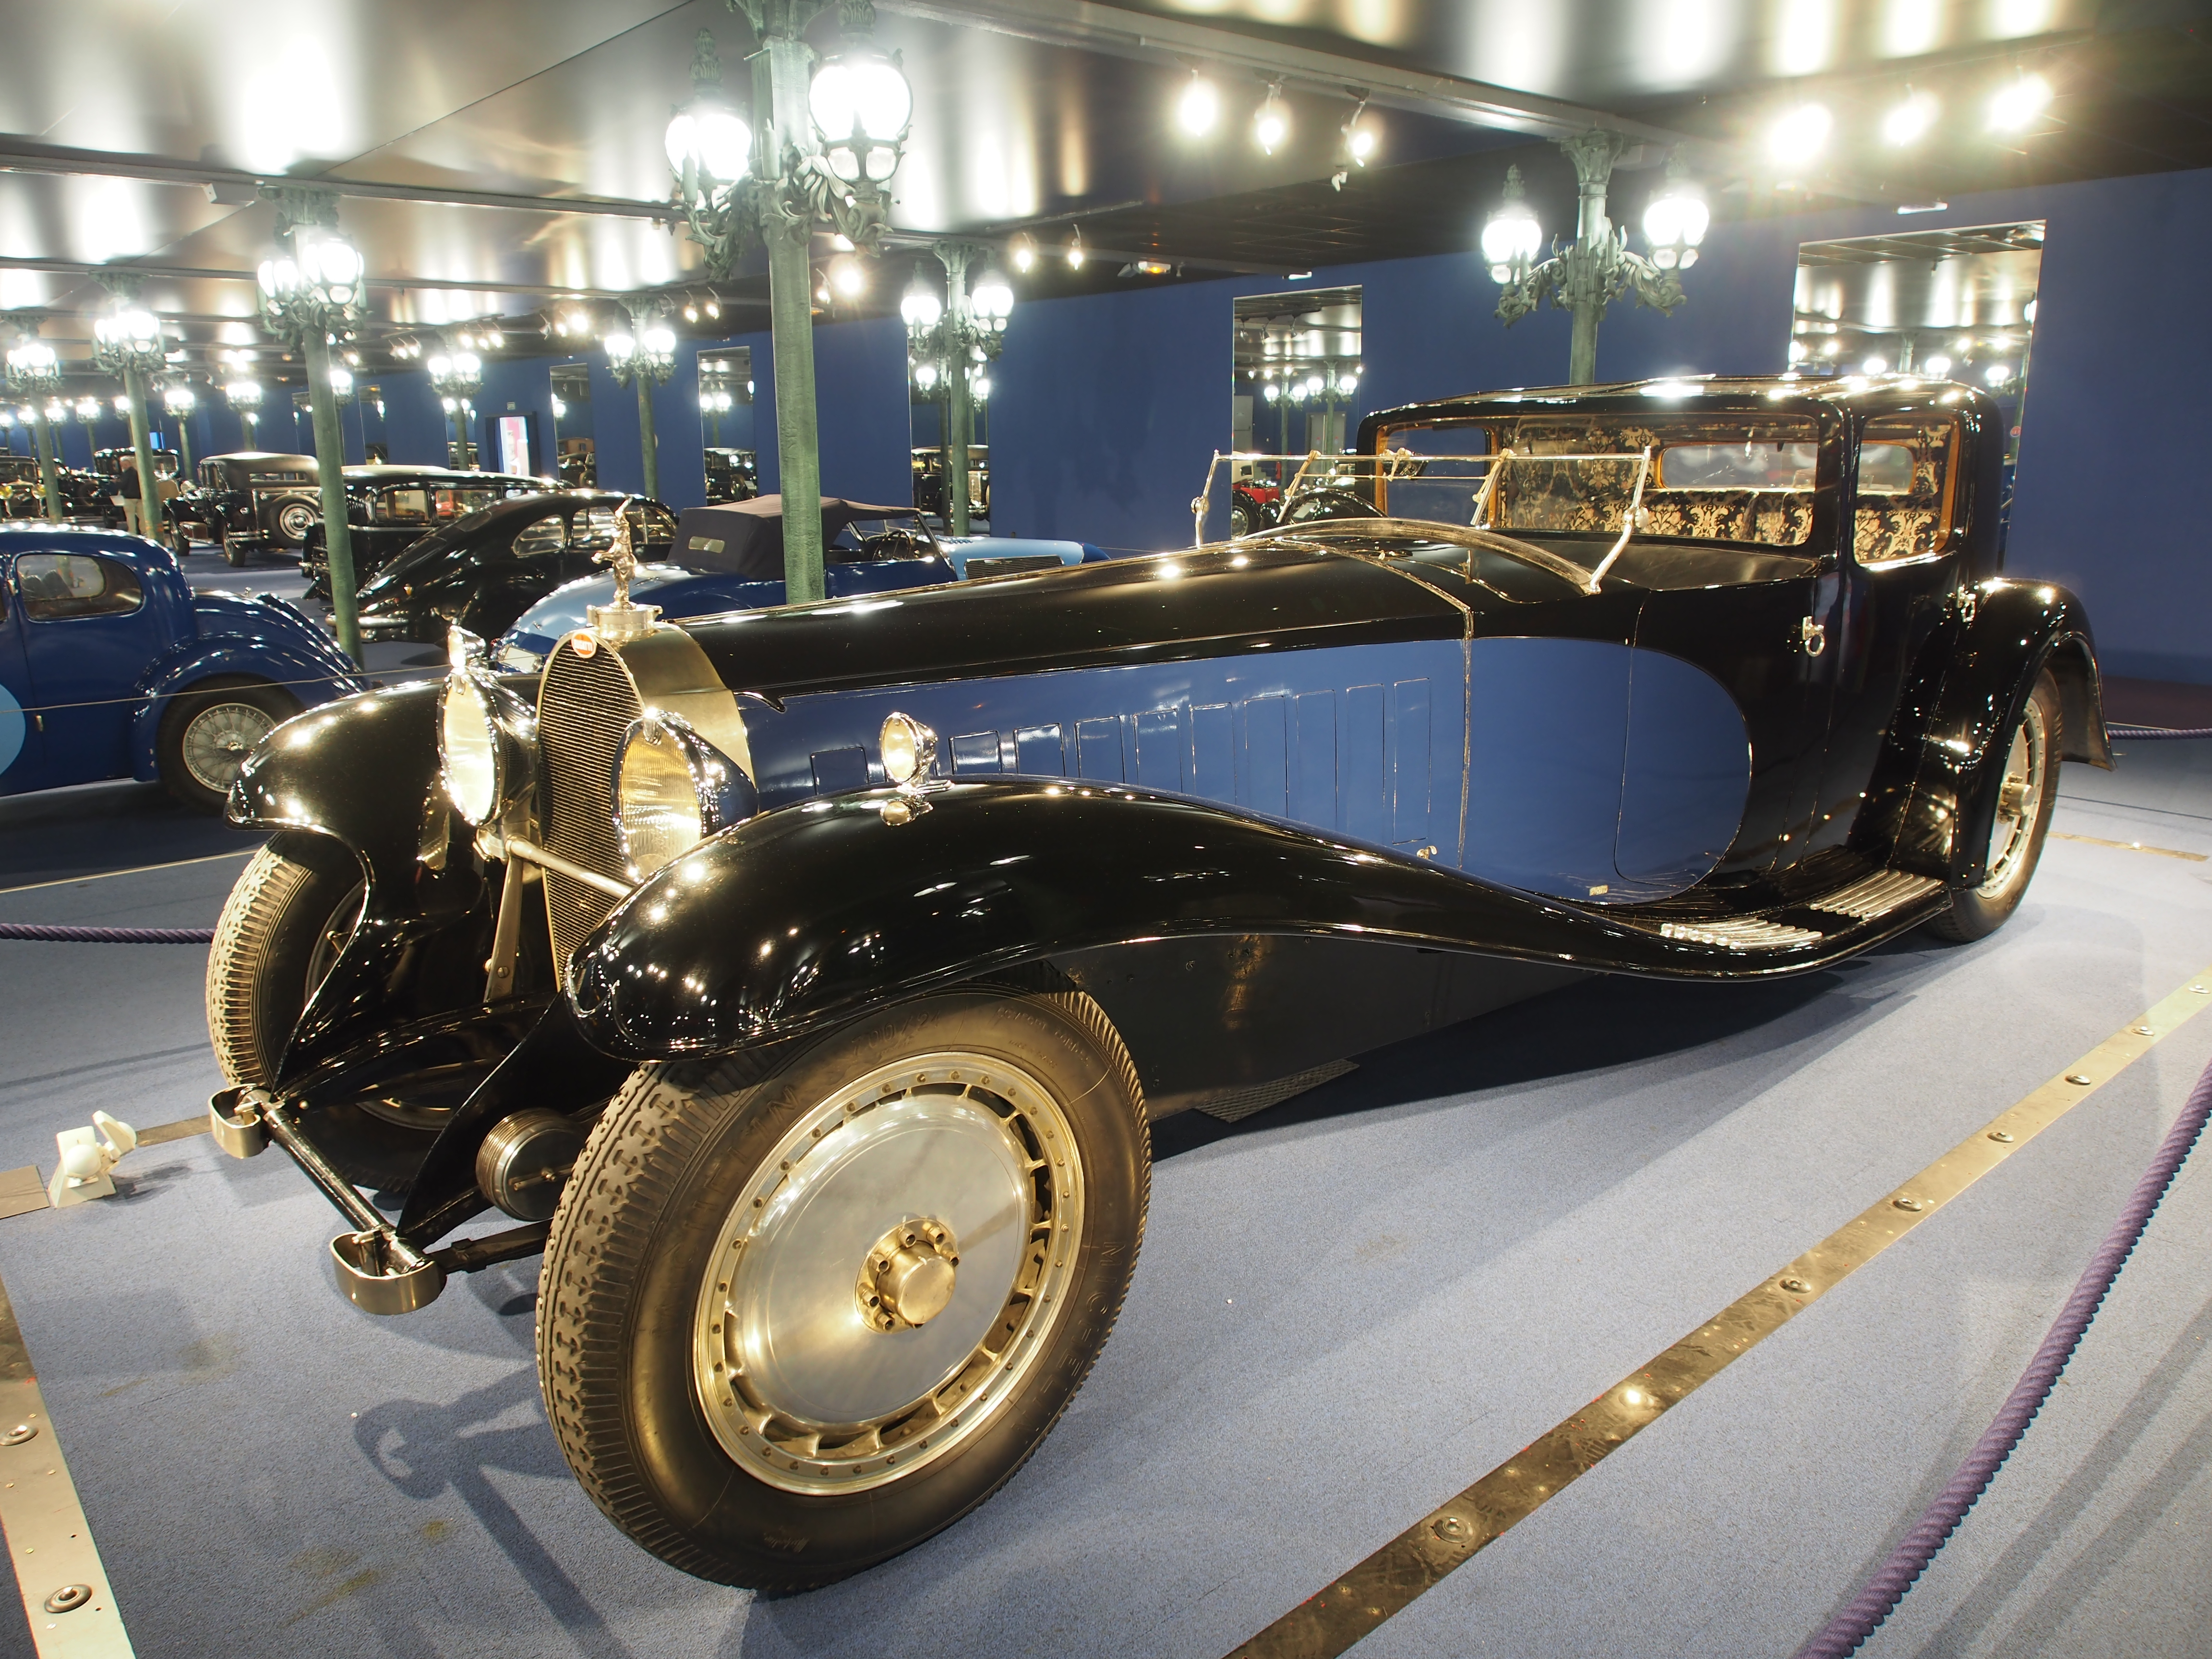 File:1929 Bugatti Royale Coupe Type 41, 300cv 12763cc 200kmh (inv 0911) photo 4.JPG - Wikimedia ...